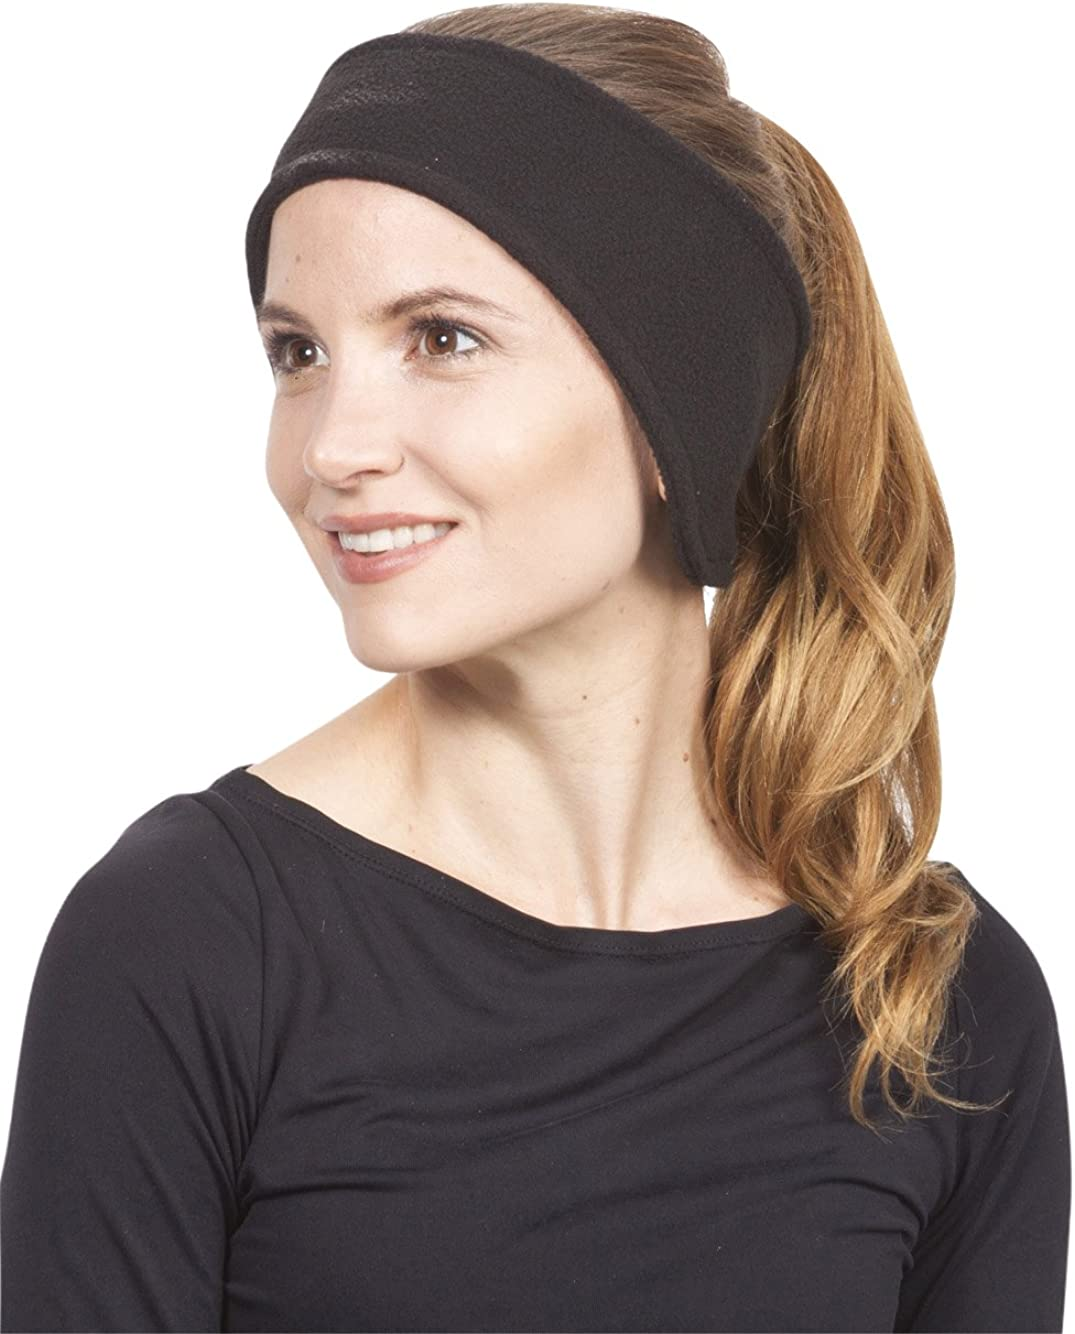 Mens/Womens Soft Stretch Fleece Headband Ear Warmer, Black